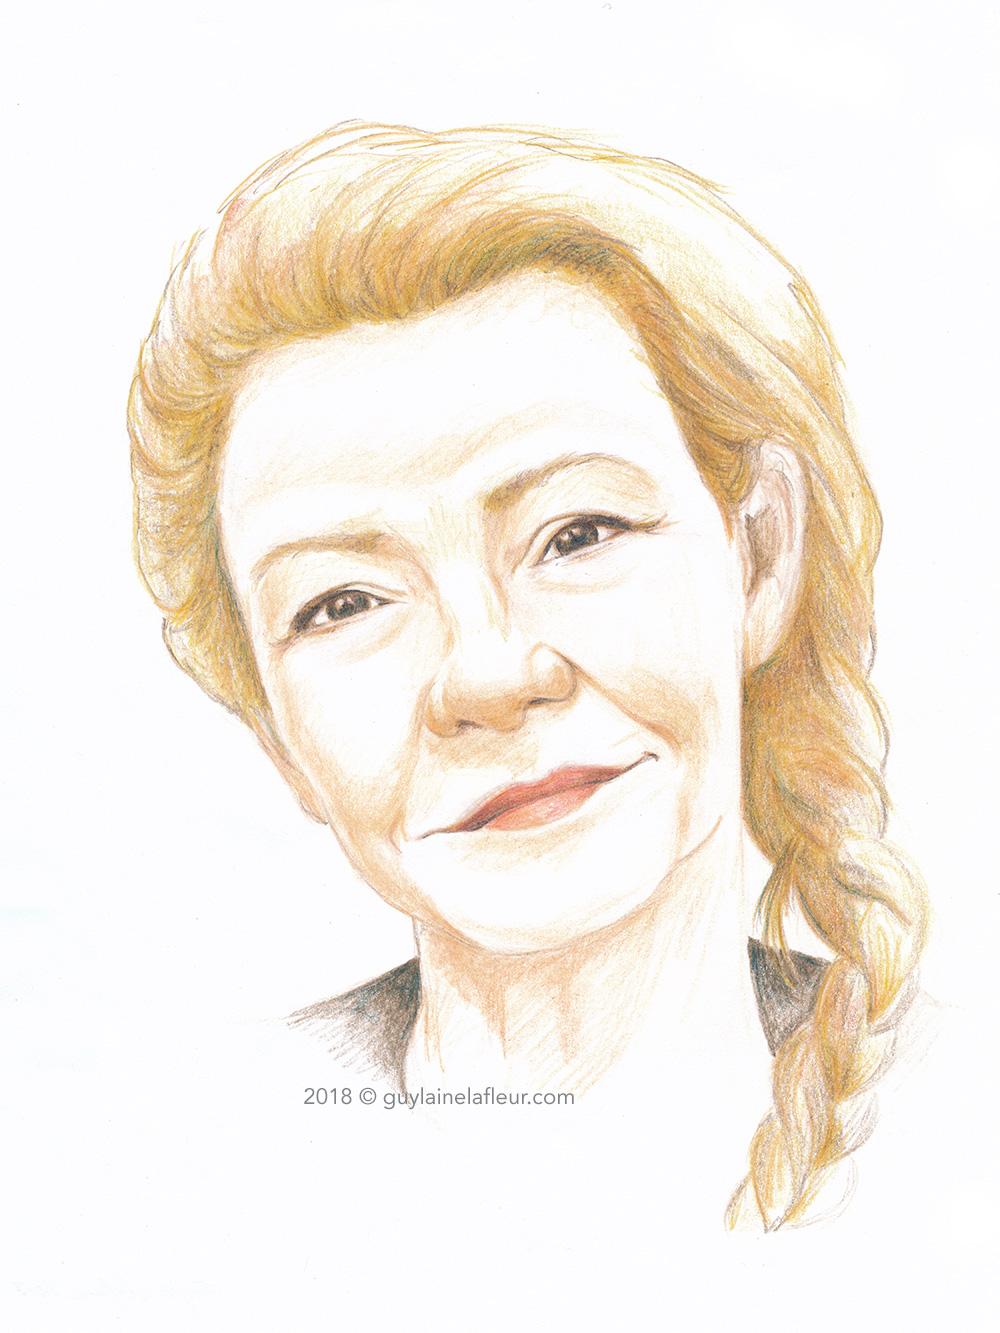 Kim - Elise Guilbault